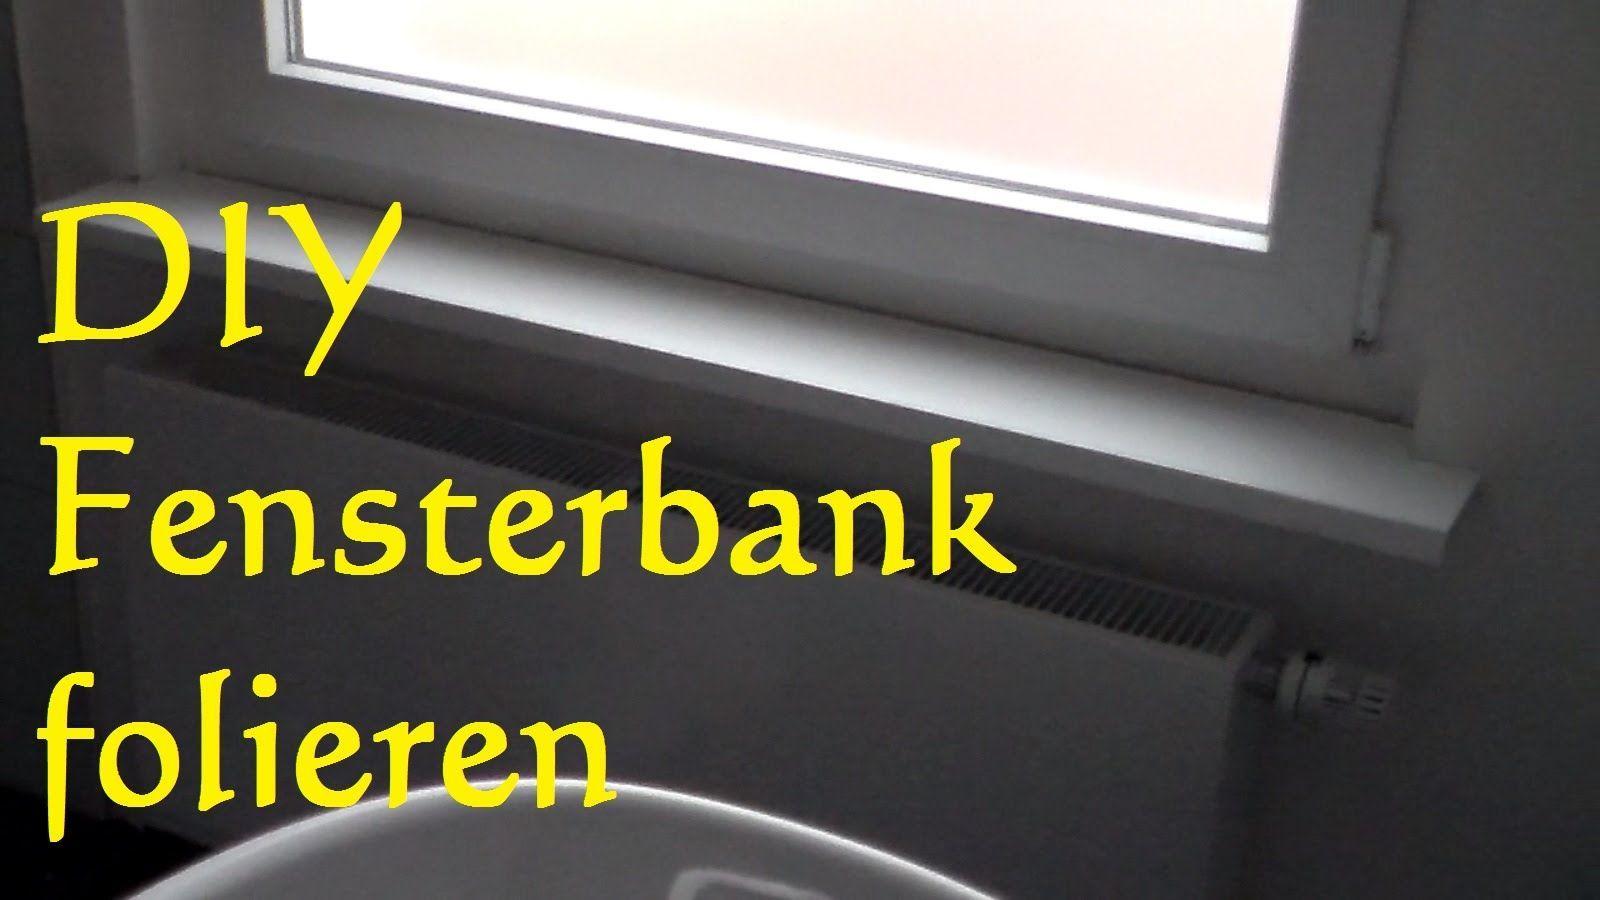 Diy Fensterbank Mit Folie Bekleben Tutorial Fens In 2020 Fenster Fensterbanke Holz Folie